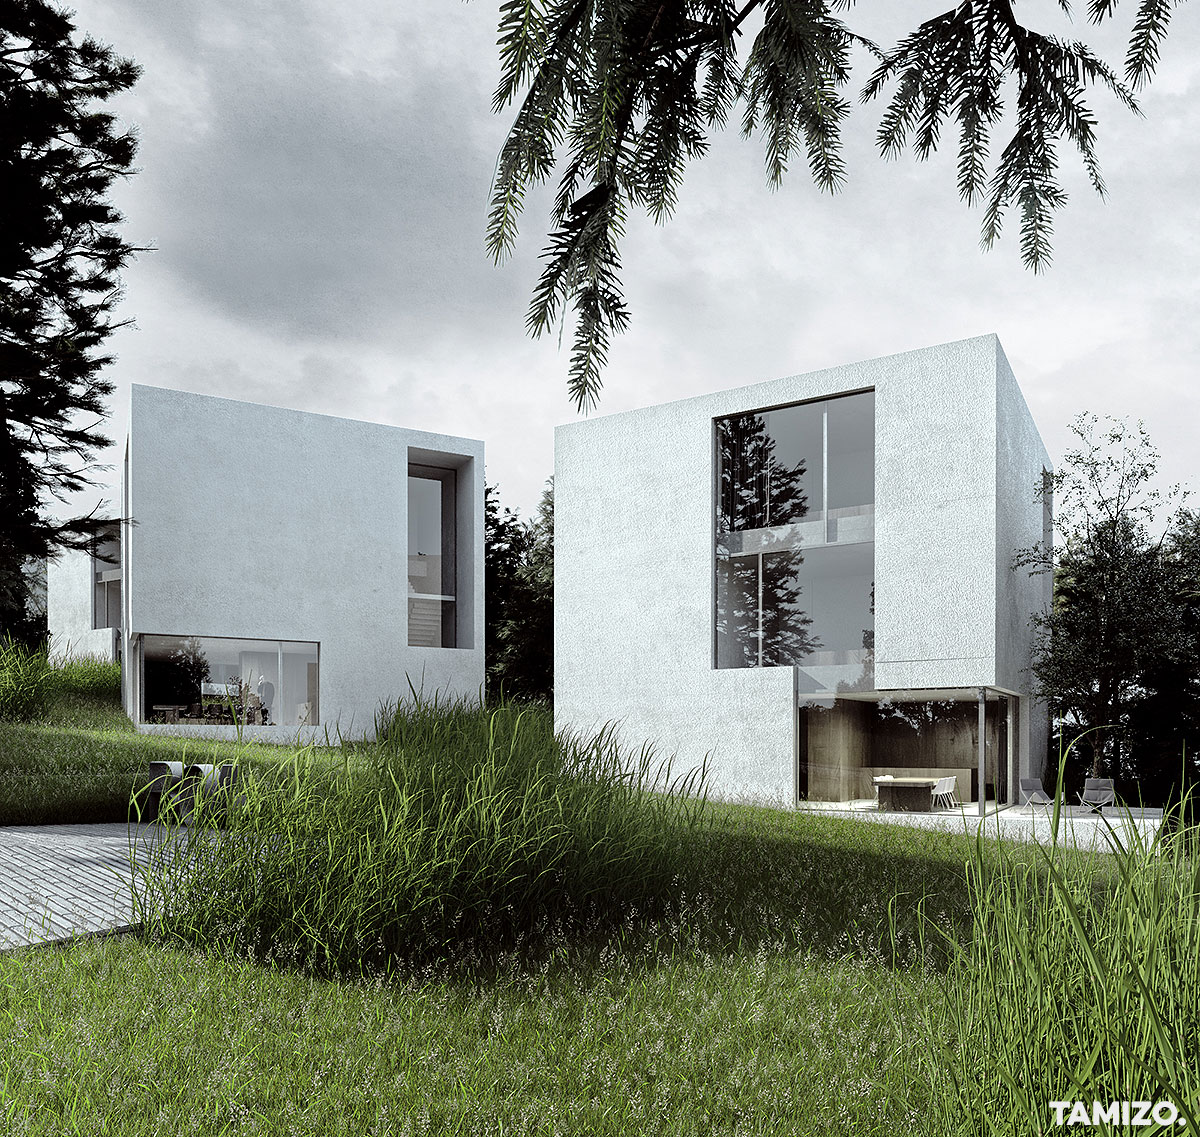 A061_tamizo_architects_competition_tbilisi_georgia_multifamily_houseing_realestate_09